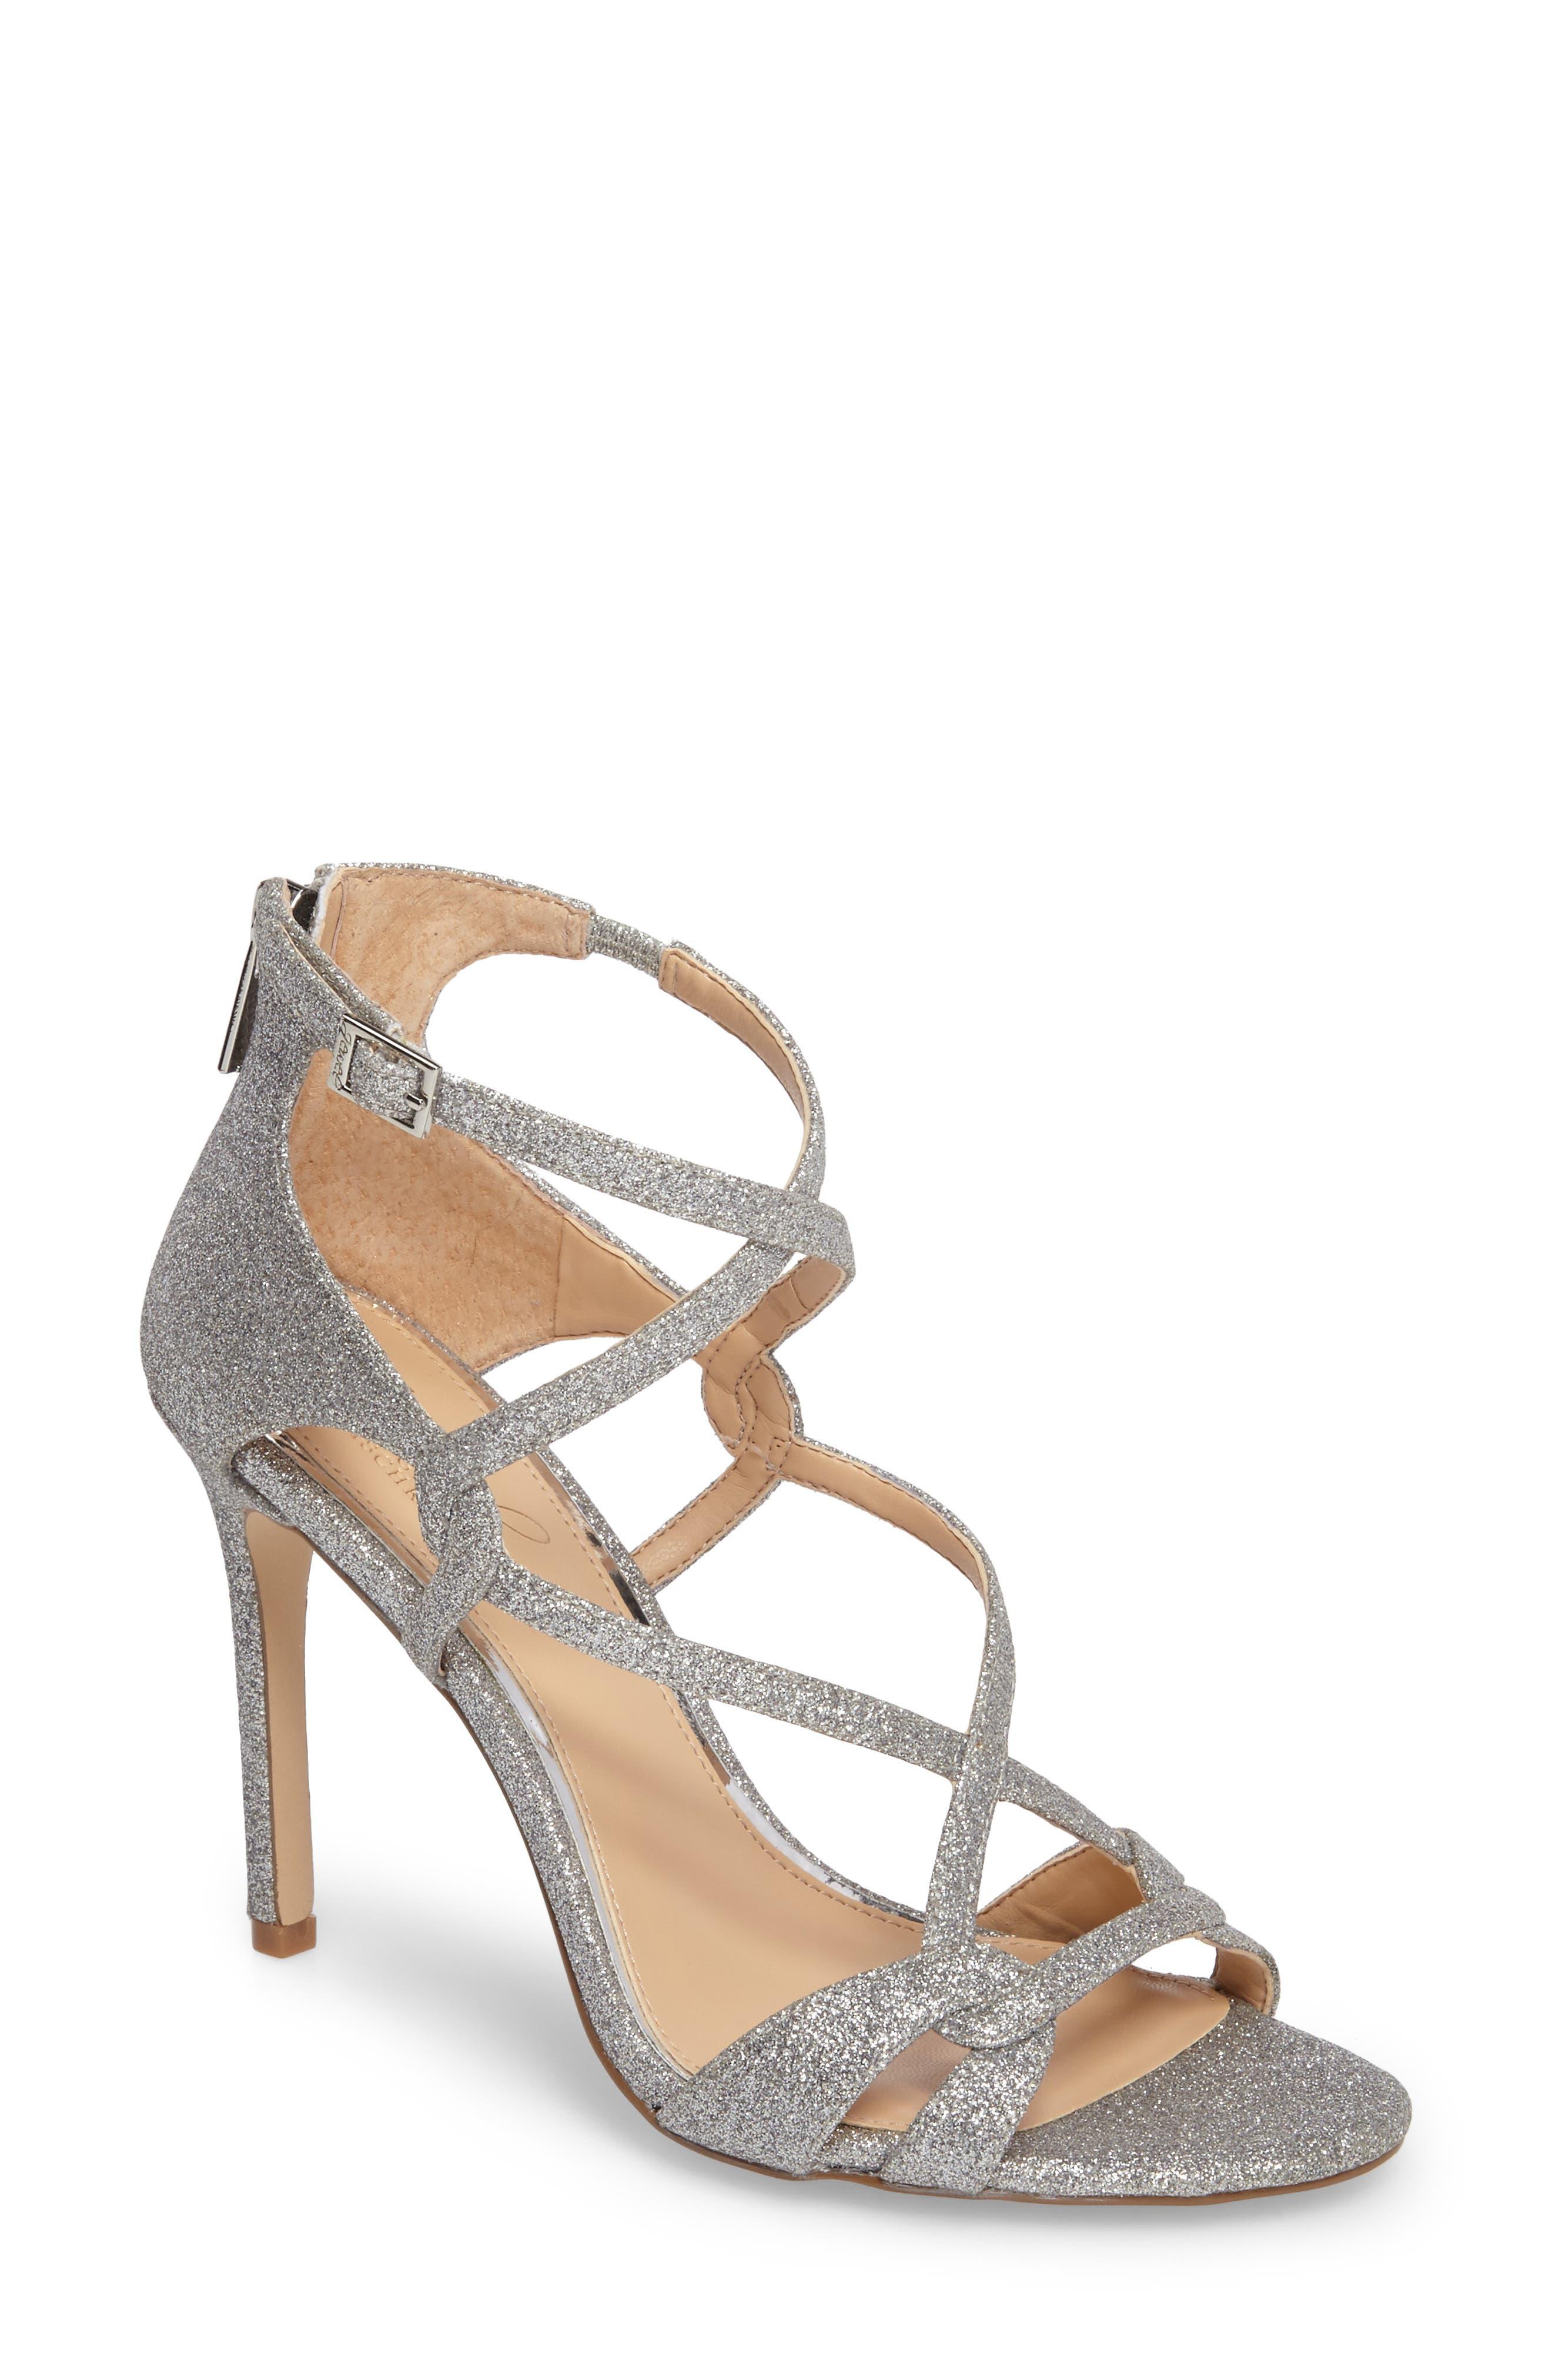 Aliza Strappy Glitter Sandal,                             Main thumbnail 1, color,                             043